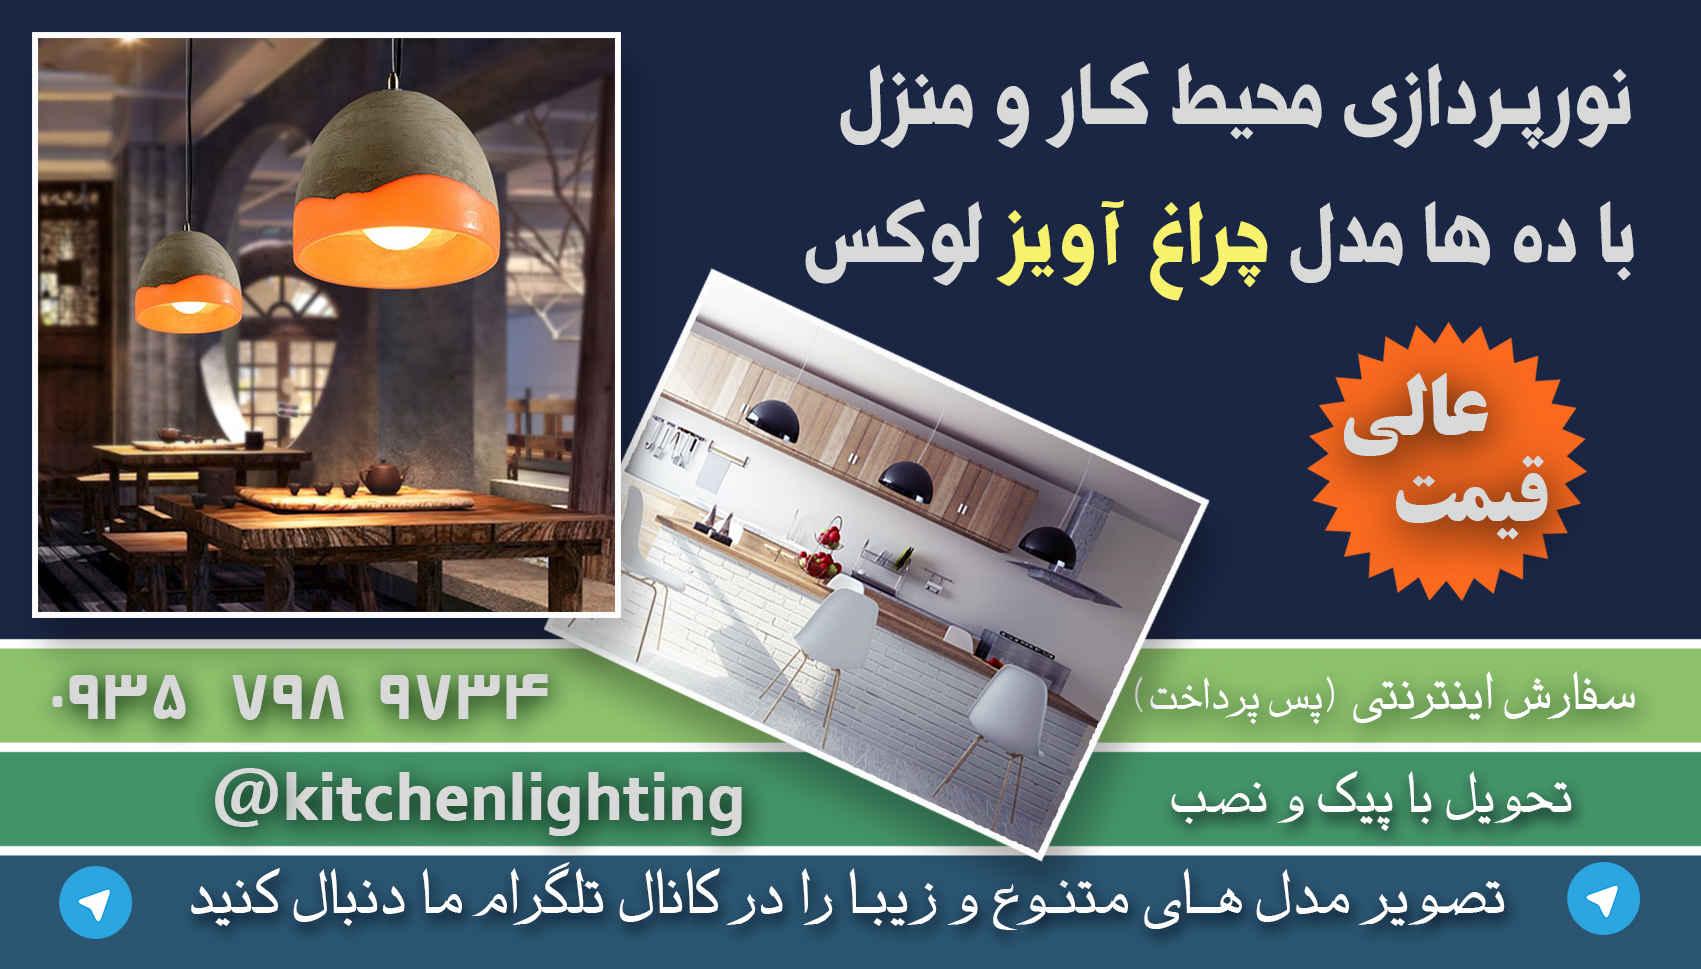 http://koocherey.persiangig.com/lampe%20aviz/aviz%202.jpg